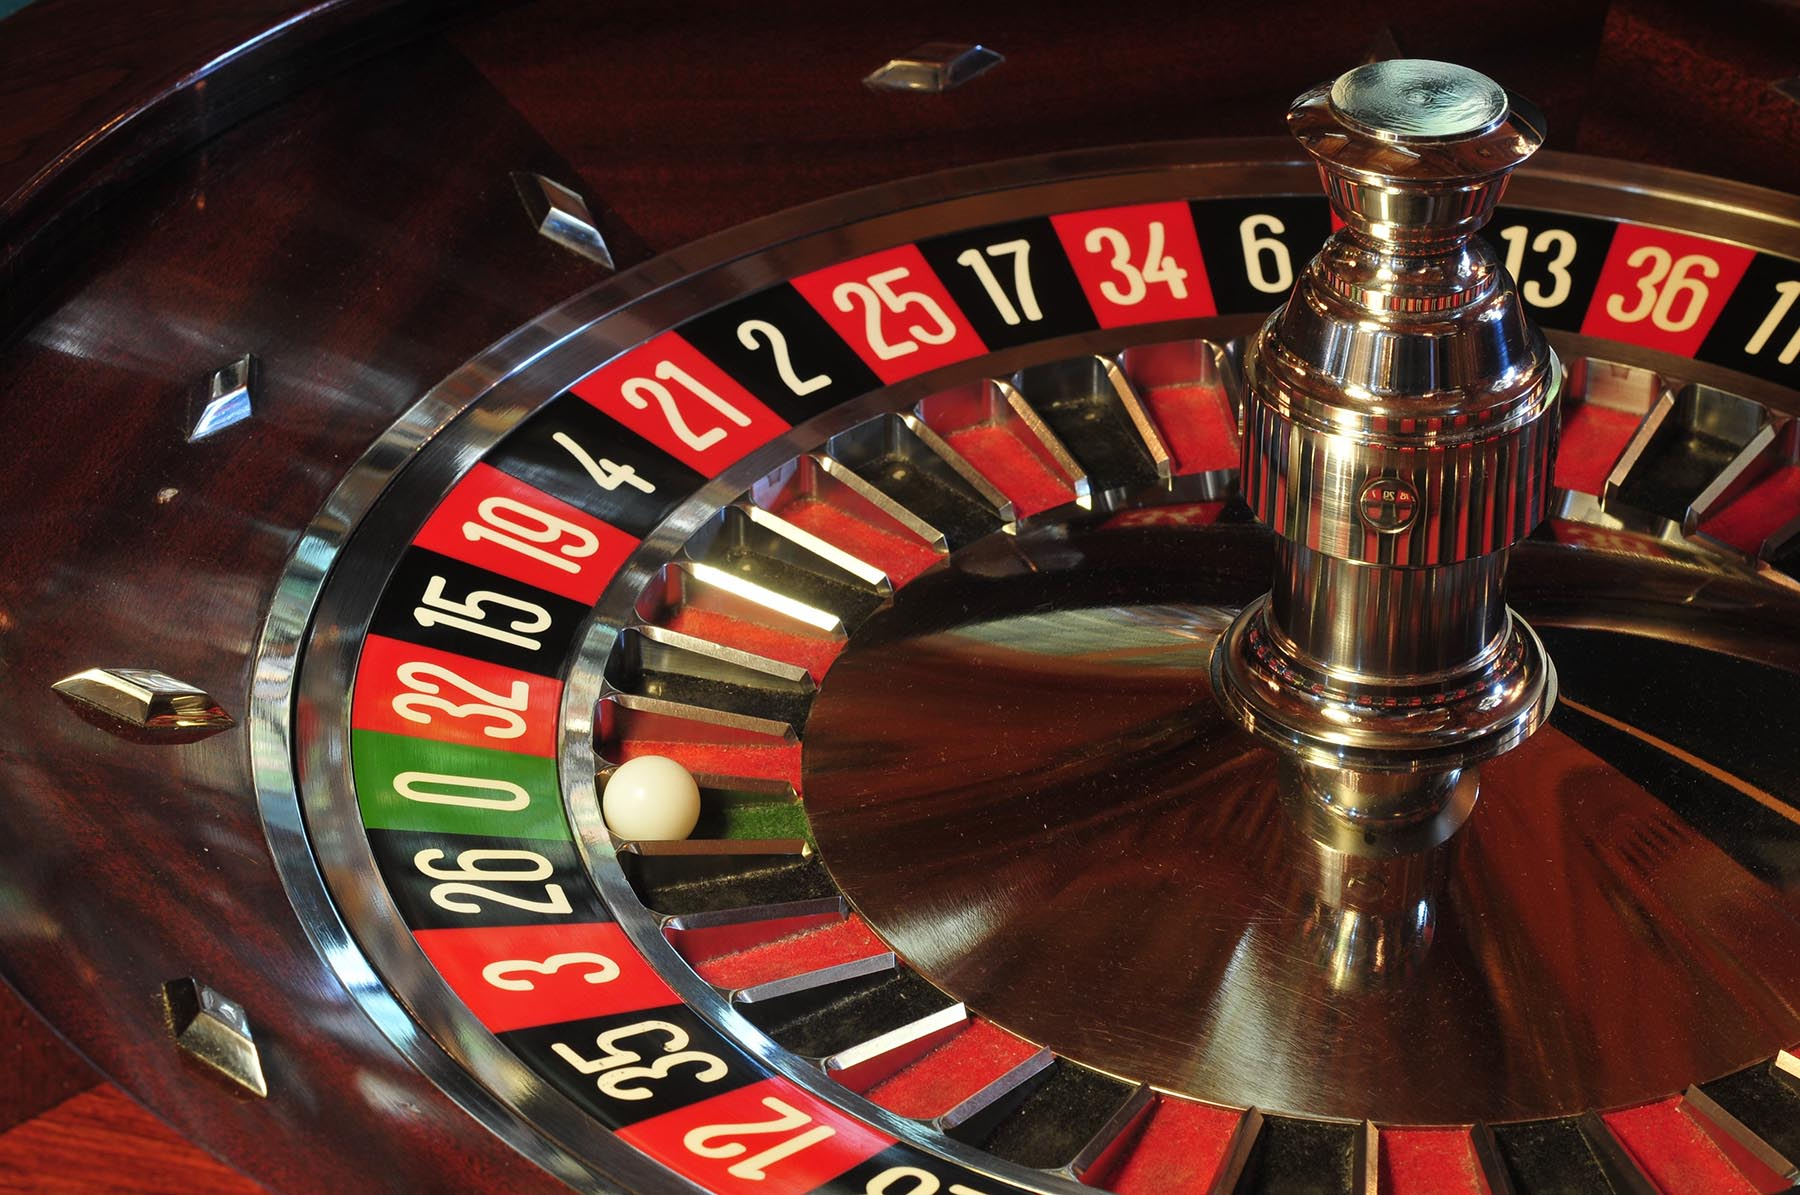 Wrist Game or Crying Shame: Omega Speedmaster 3210 52 Casino